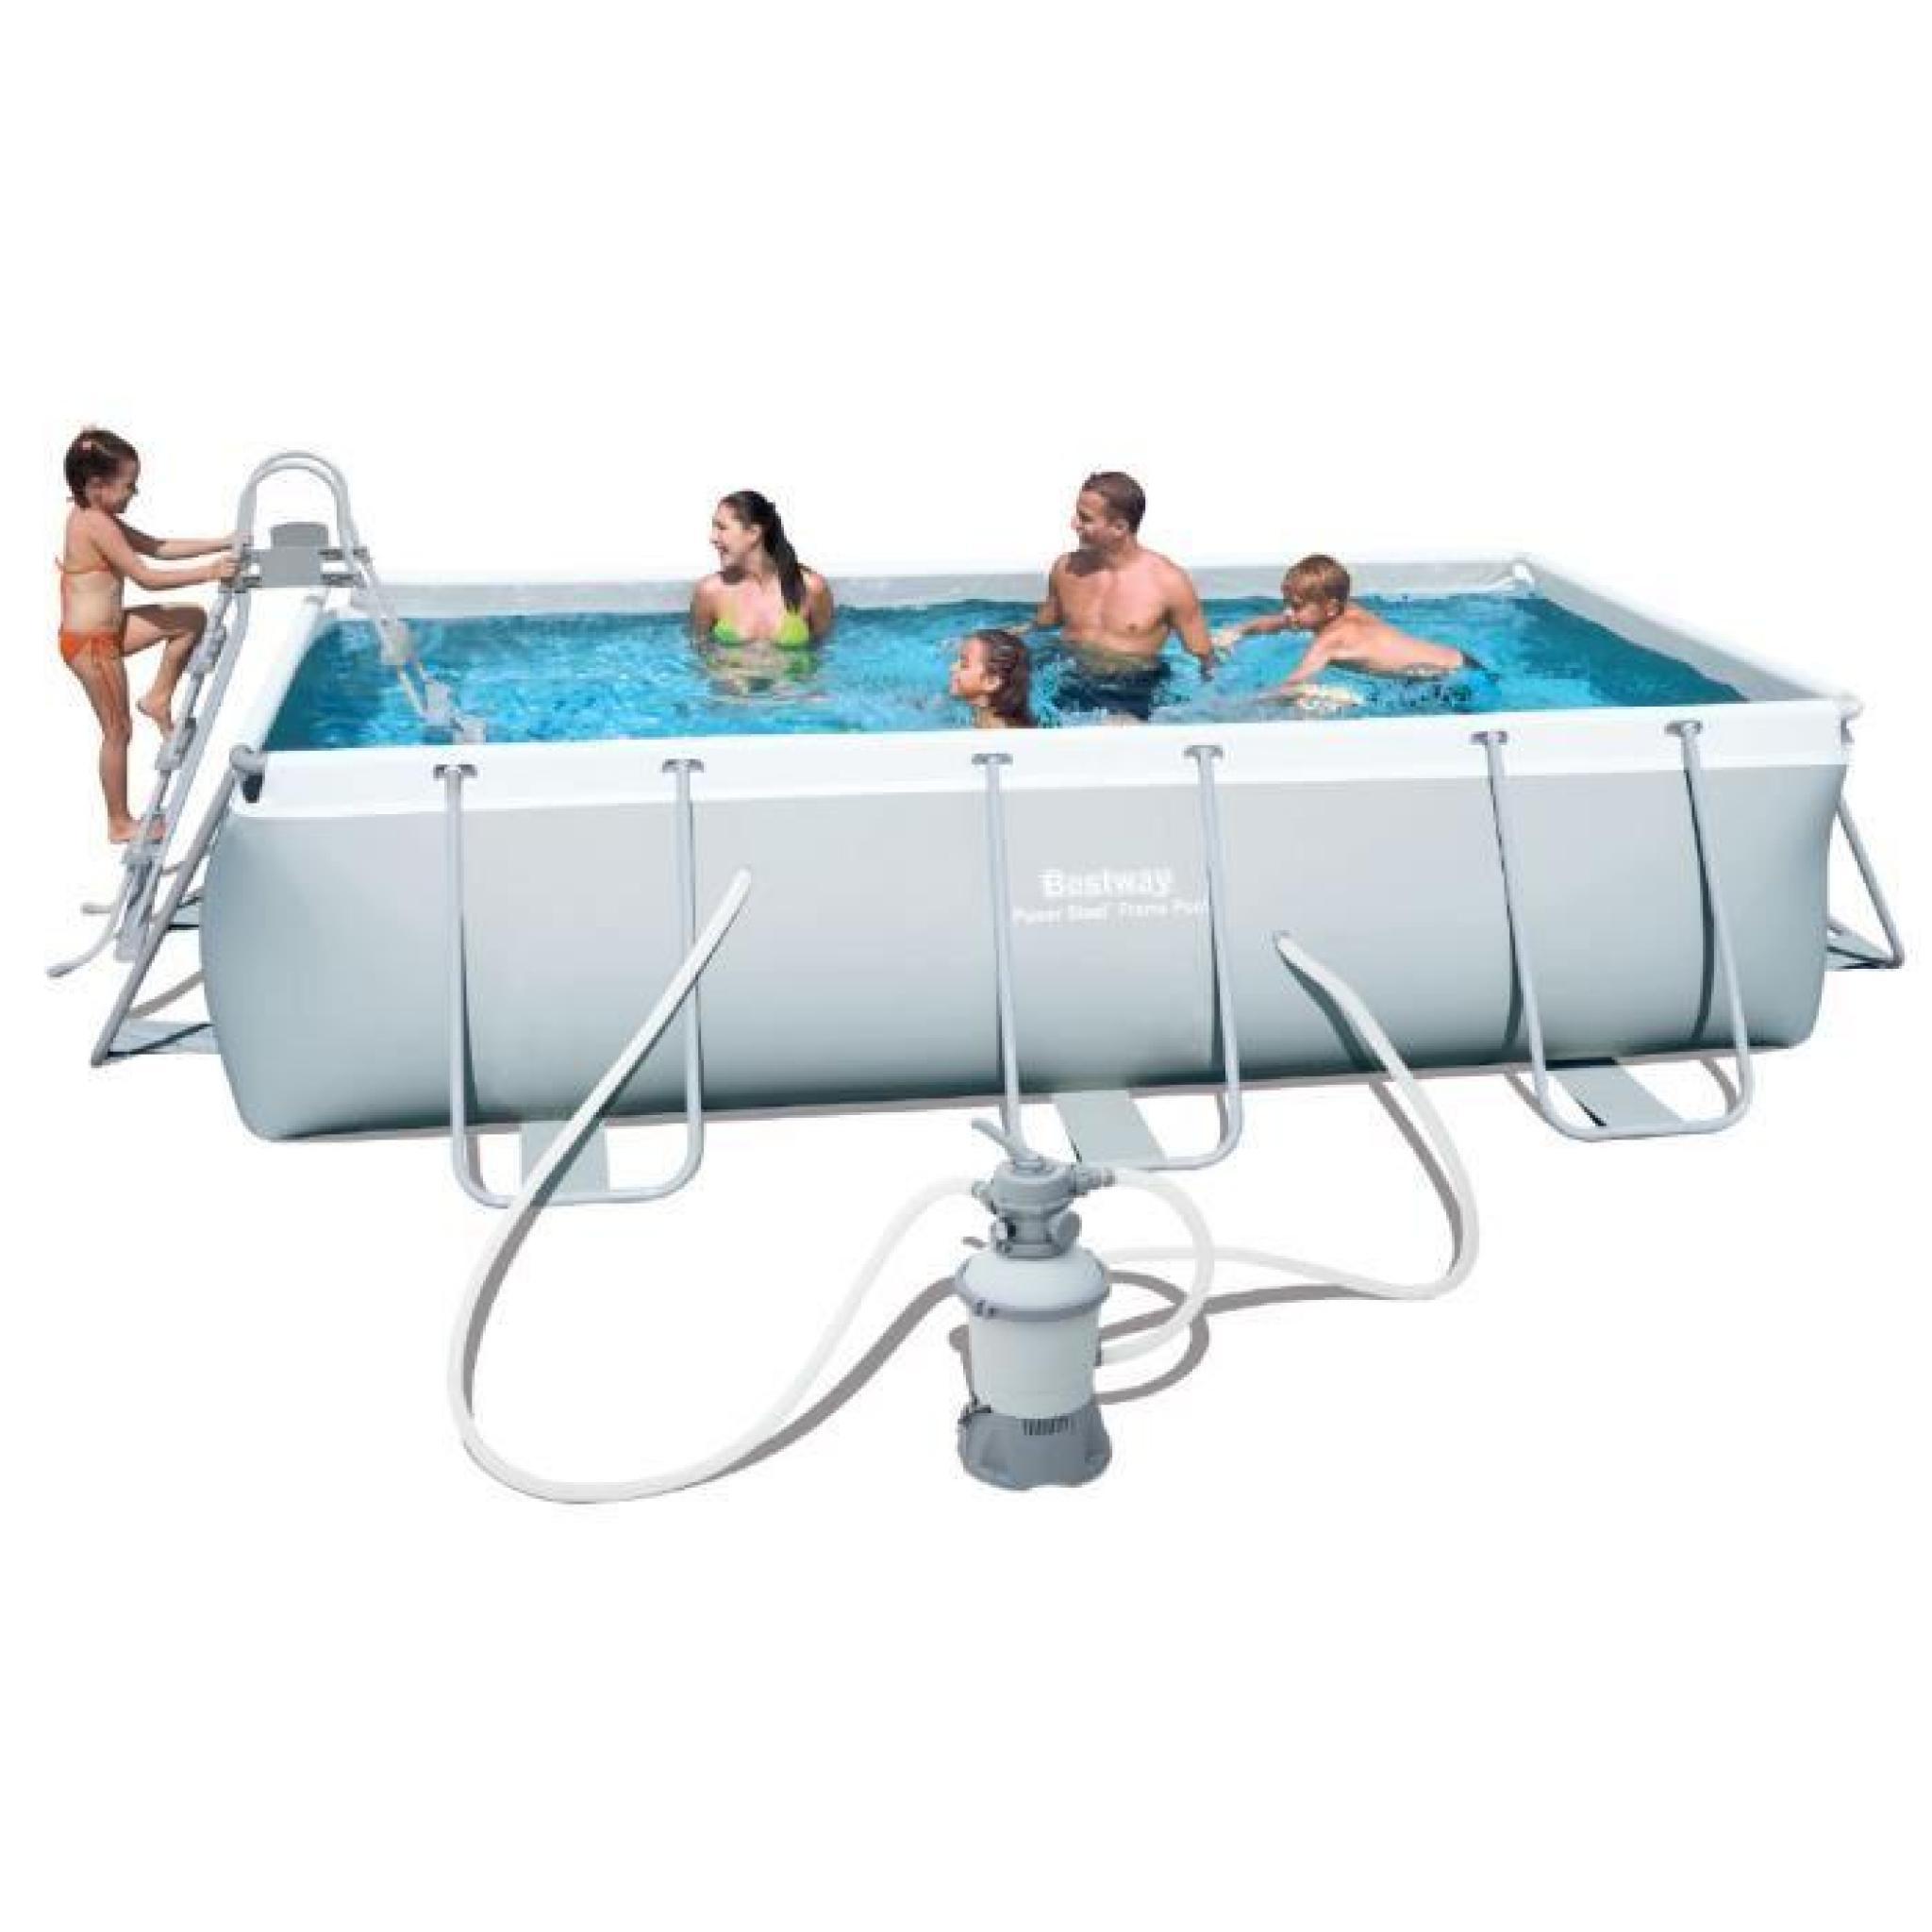 Piscine tubulaire rectangulaire bestway - Sable silice n 20 piscine ...